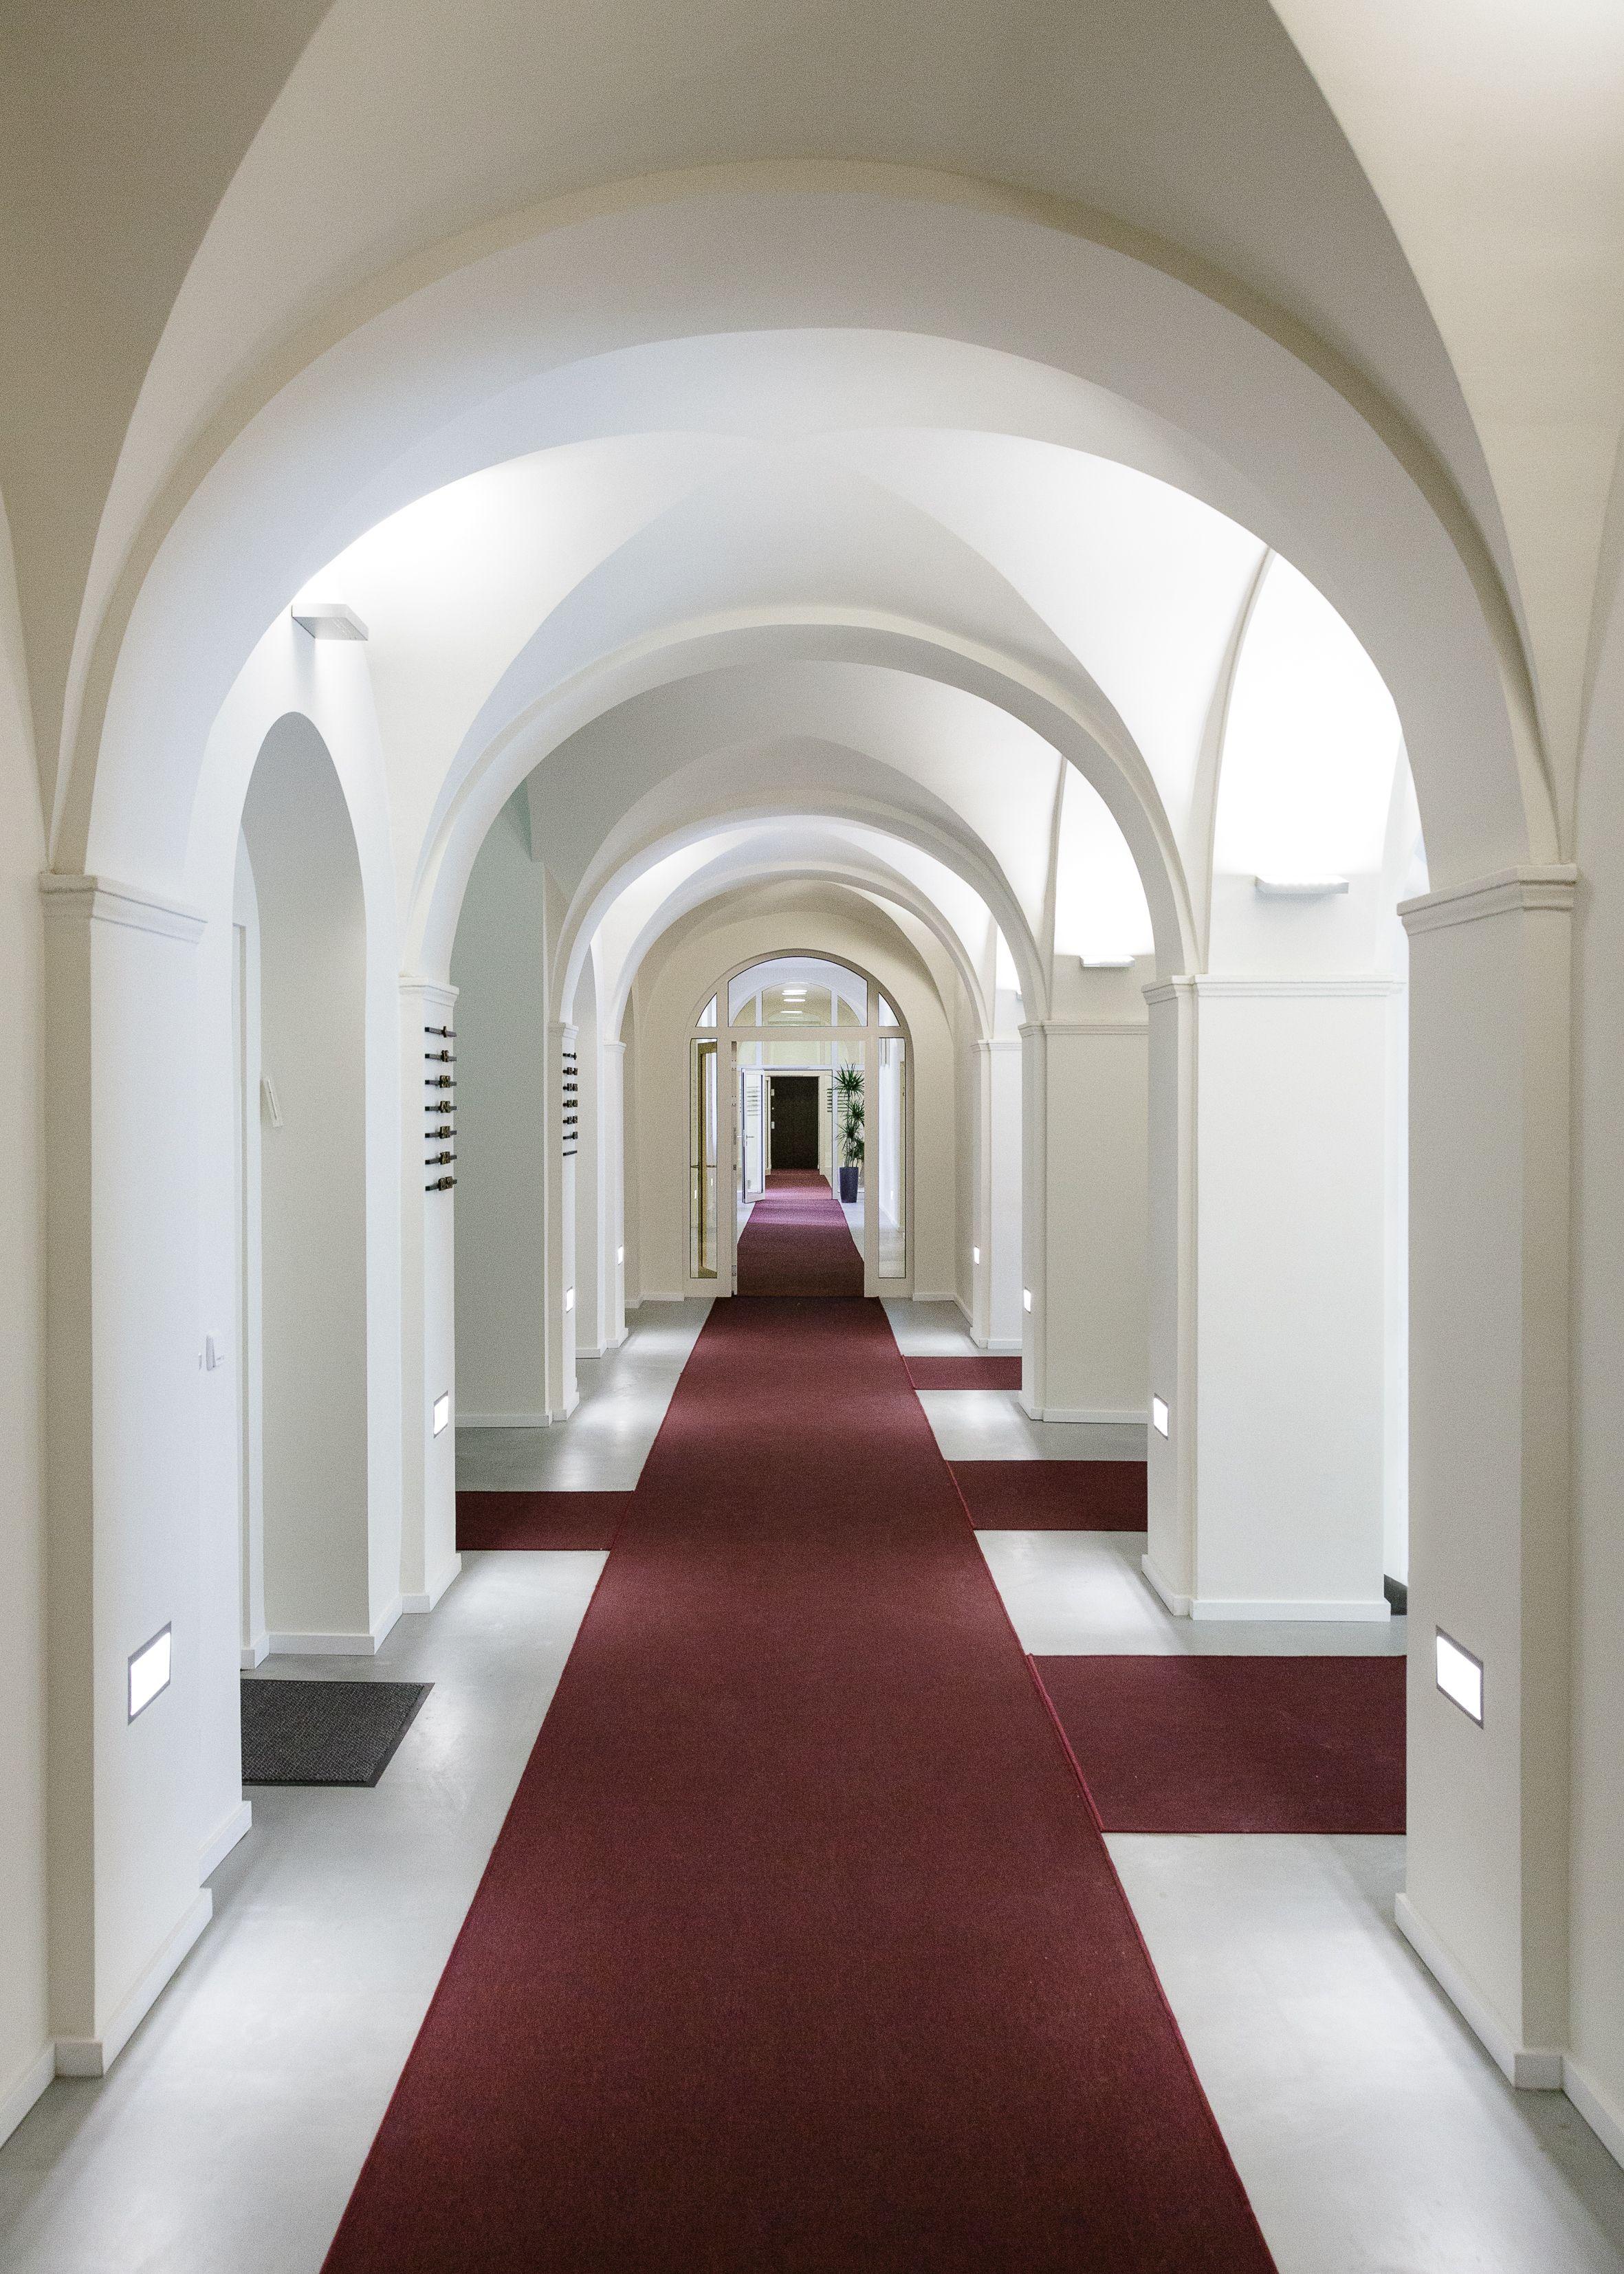 Paragon Apartments - Hallway